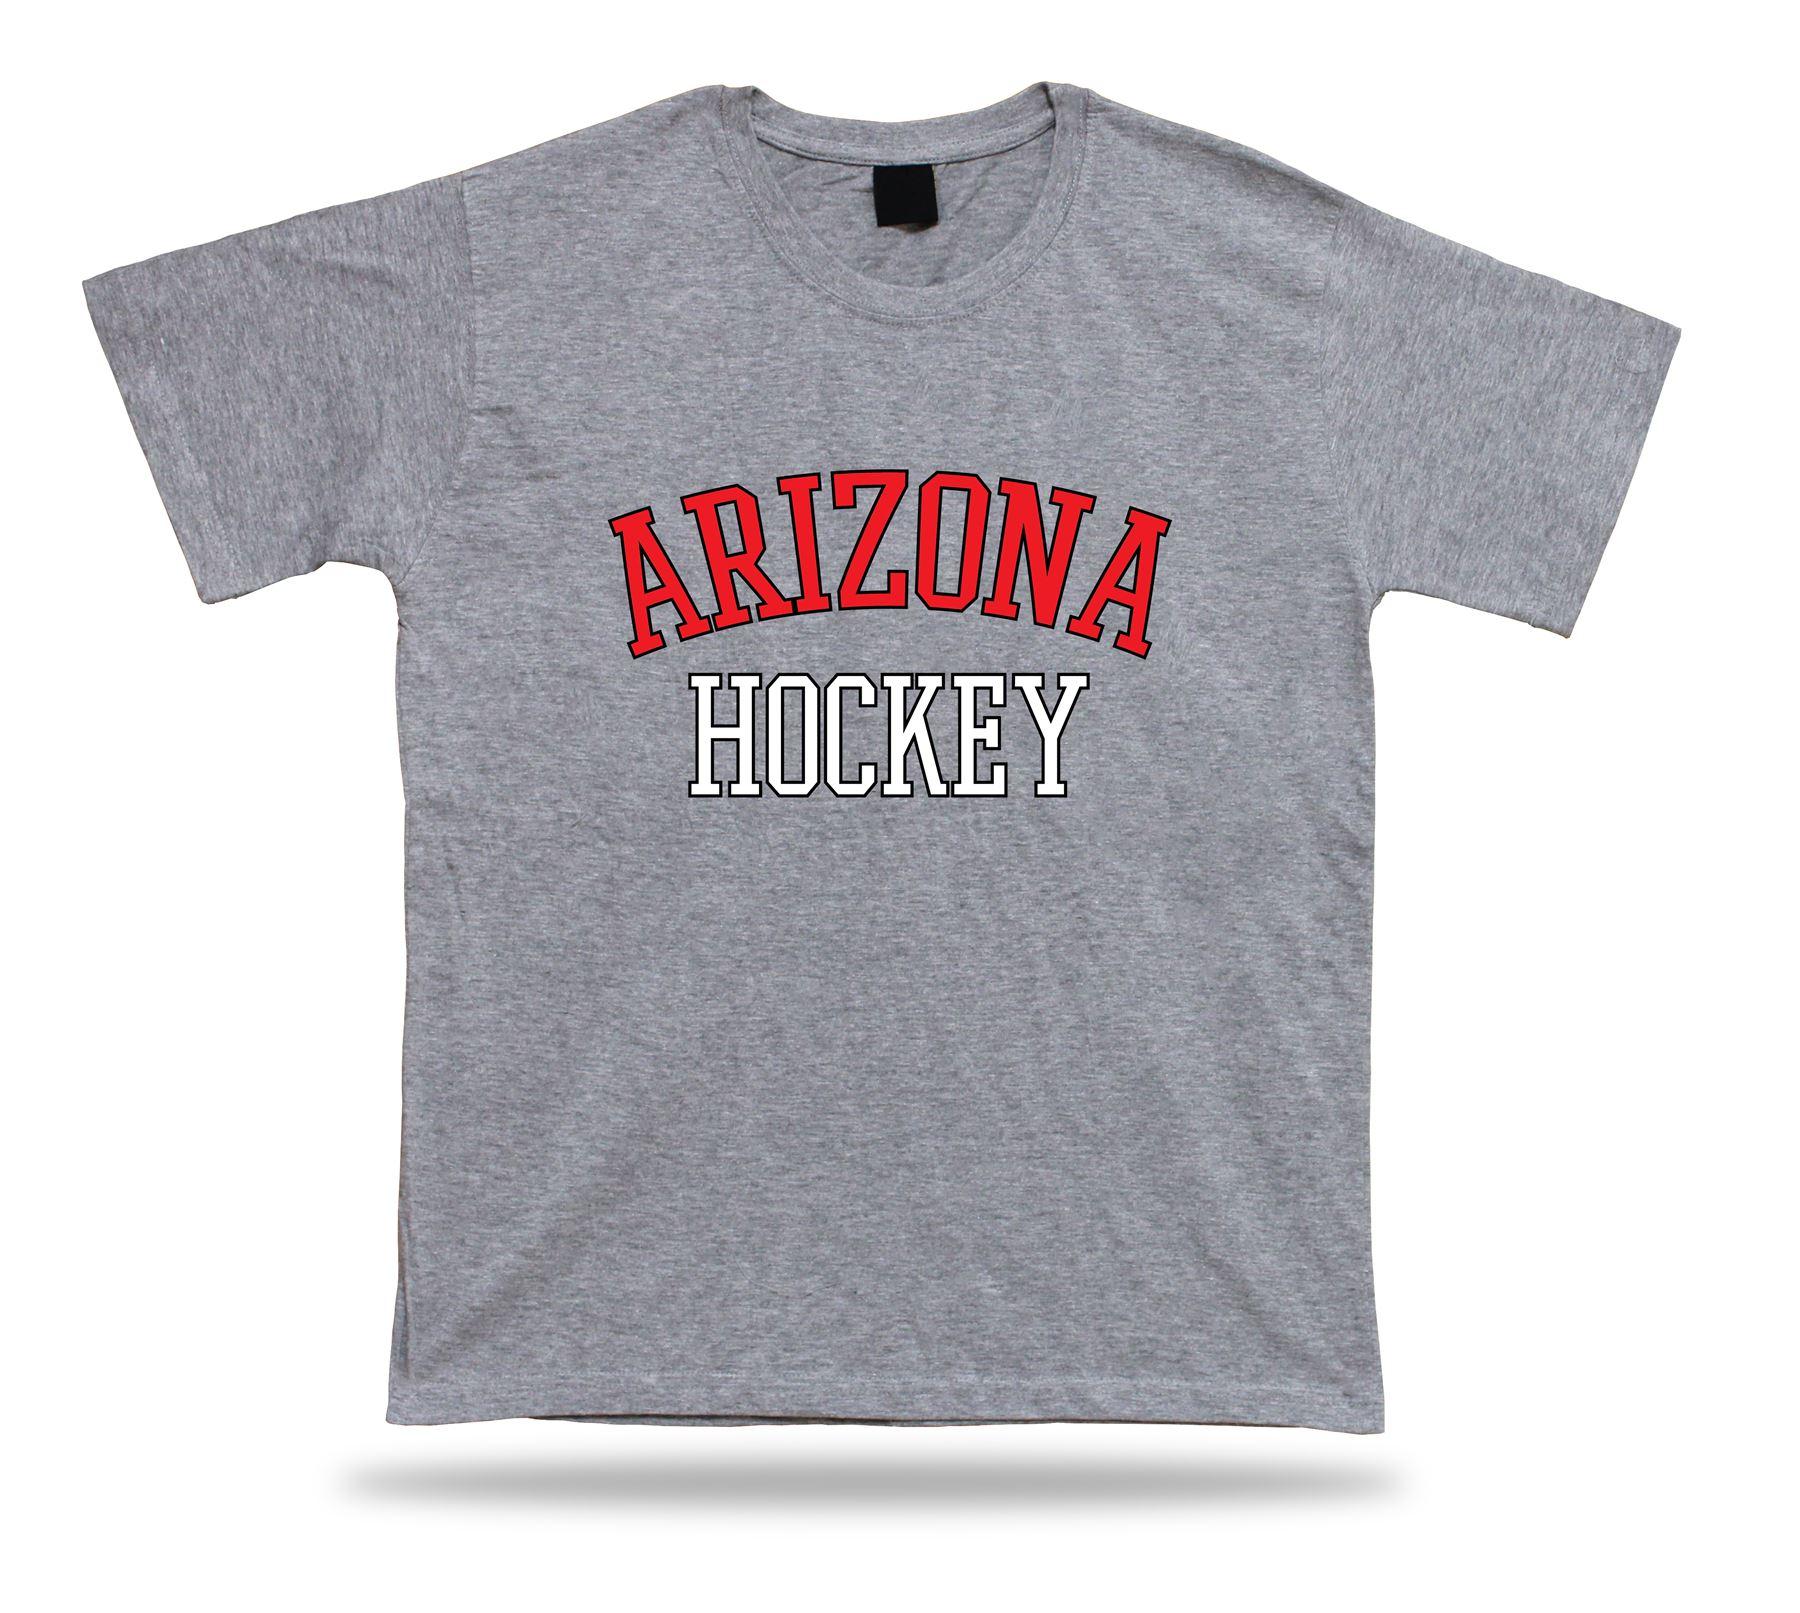 Arizona hockey t shirt tee red black white az usa ice for T shirt design usa